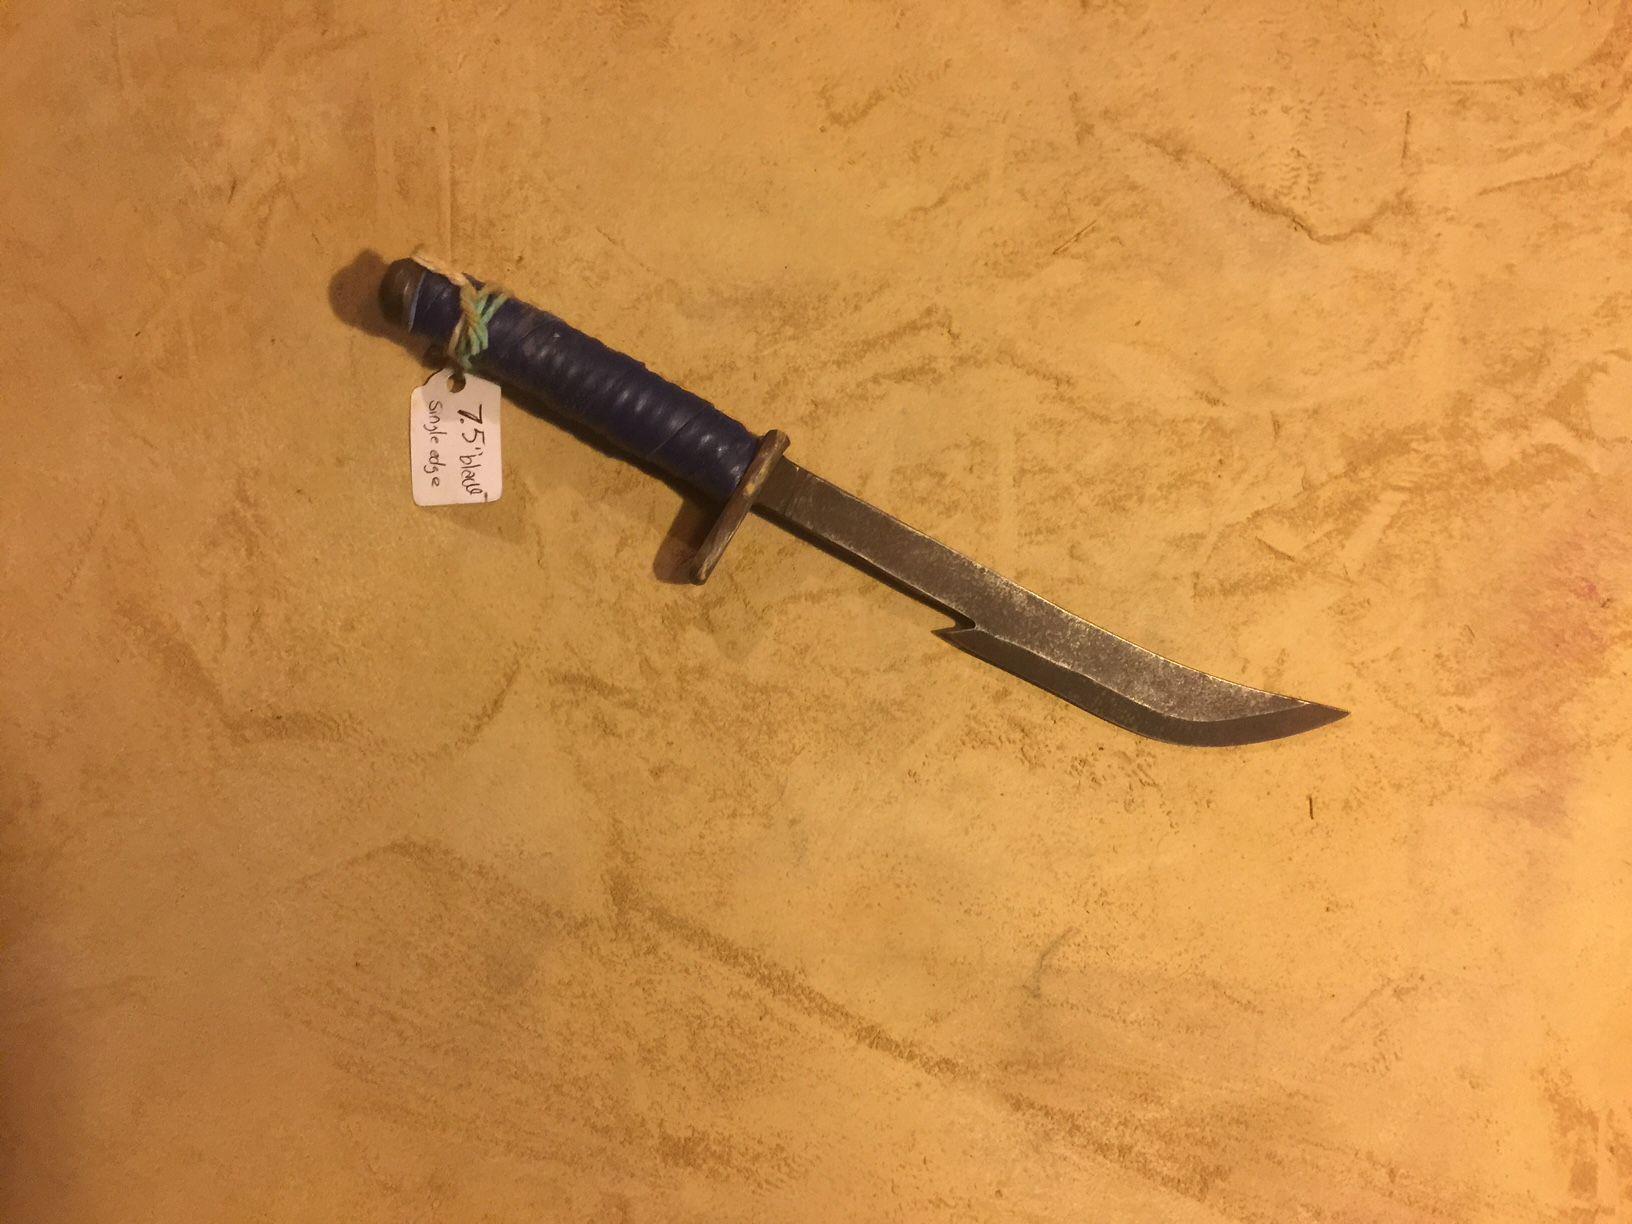 Blue handled high carbon single edge knife http://www.mylaforge.com/store/blue-handled-high-carbon-single-edge-knife-2